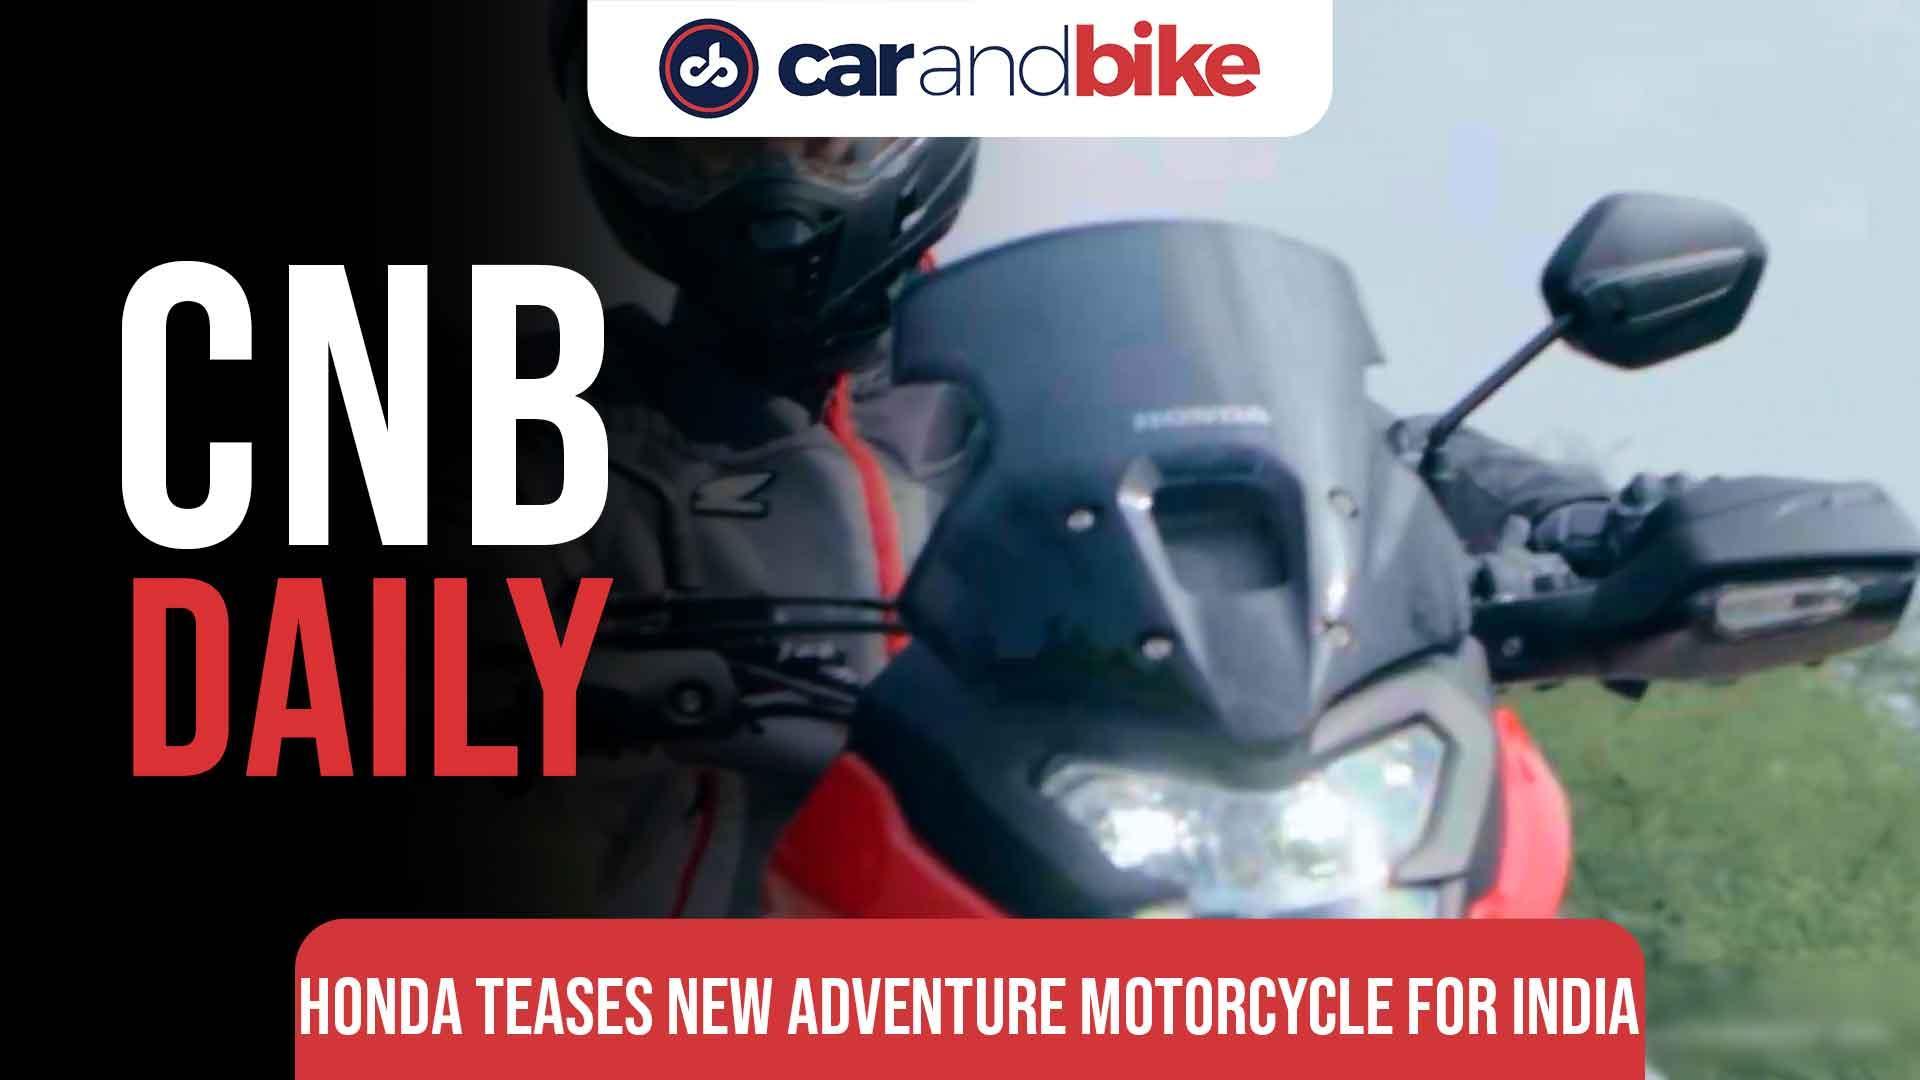 Honda Two-Wheeler Teases New Small-Capacity Adventure Motorcycle